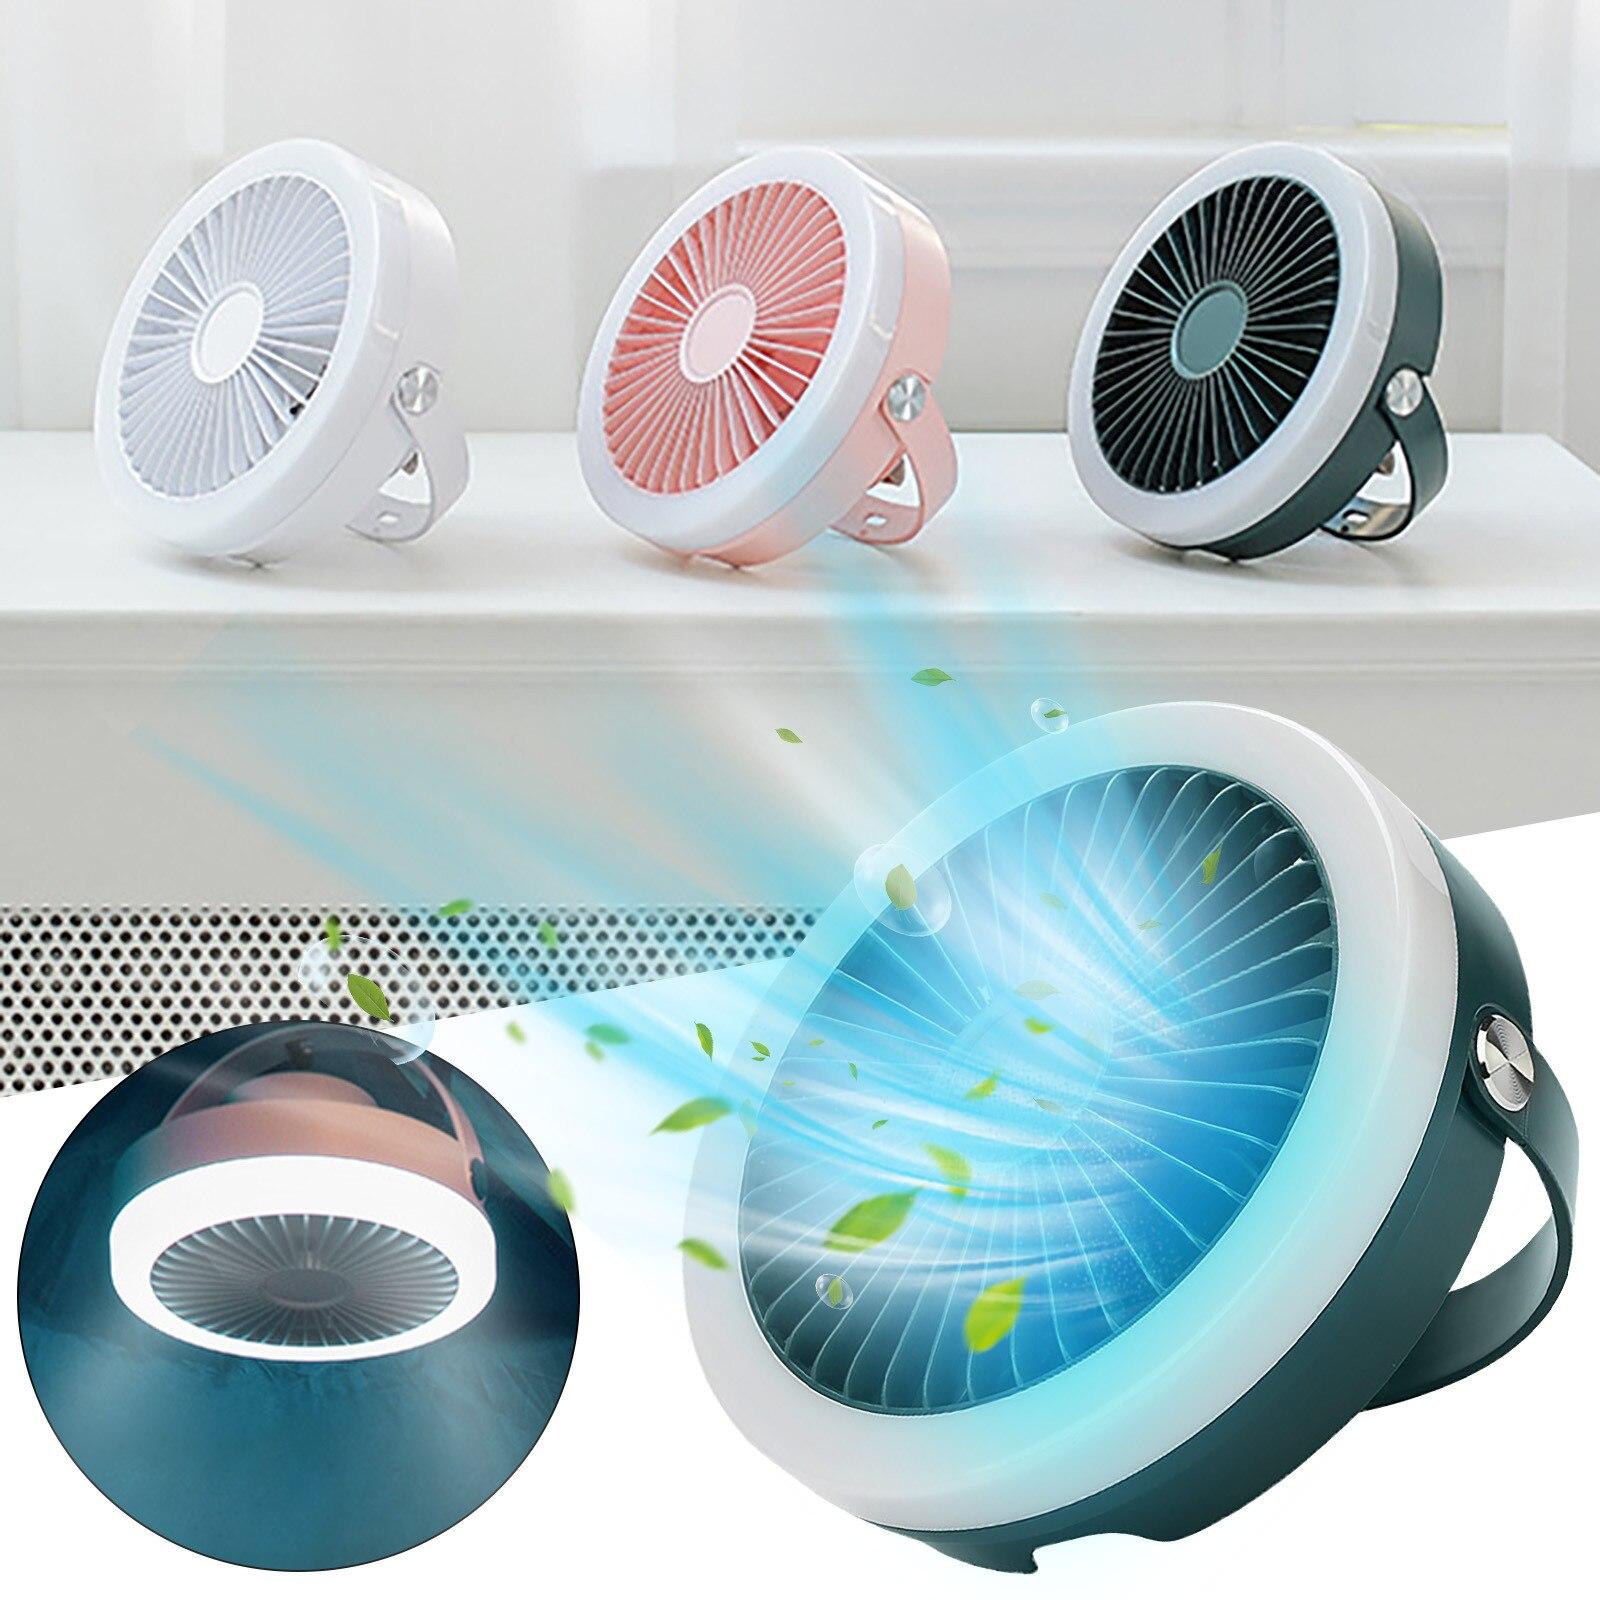 luz anel usb recarregável portátil ao ar